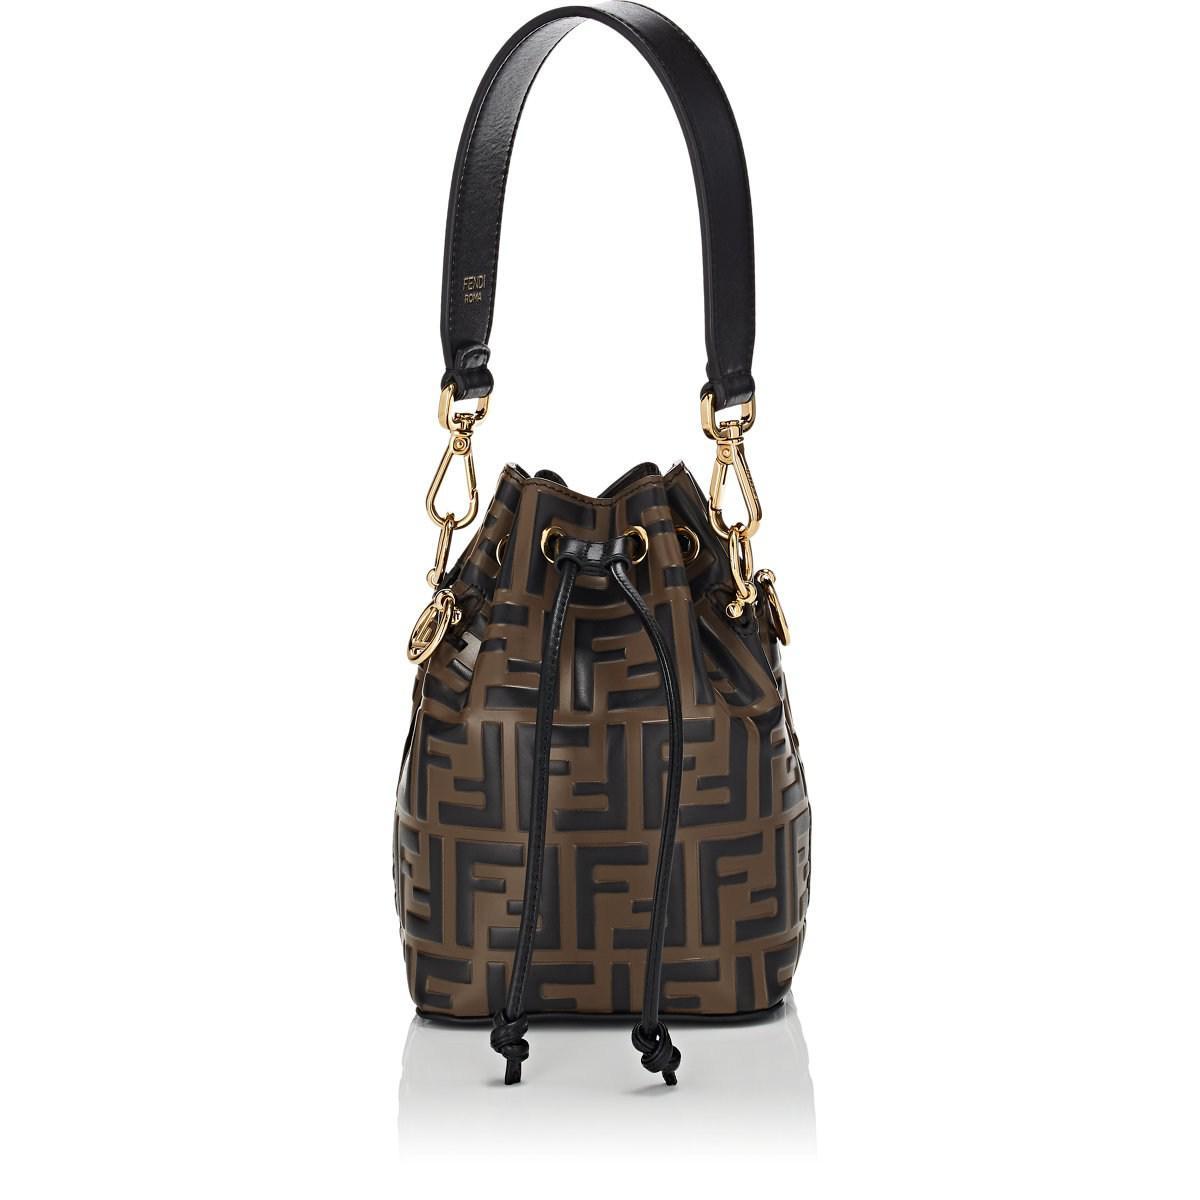 99f866fc4e73 ... shop fendi mon tresor mini leather bucket bag in brown lyst 8925c c464f